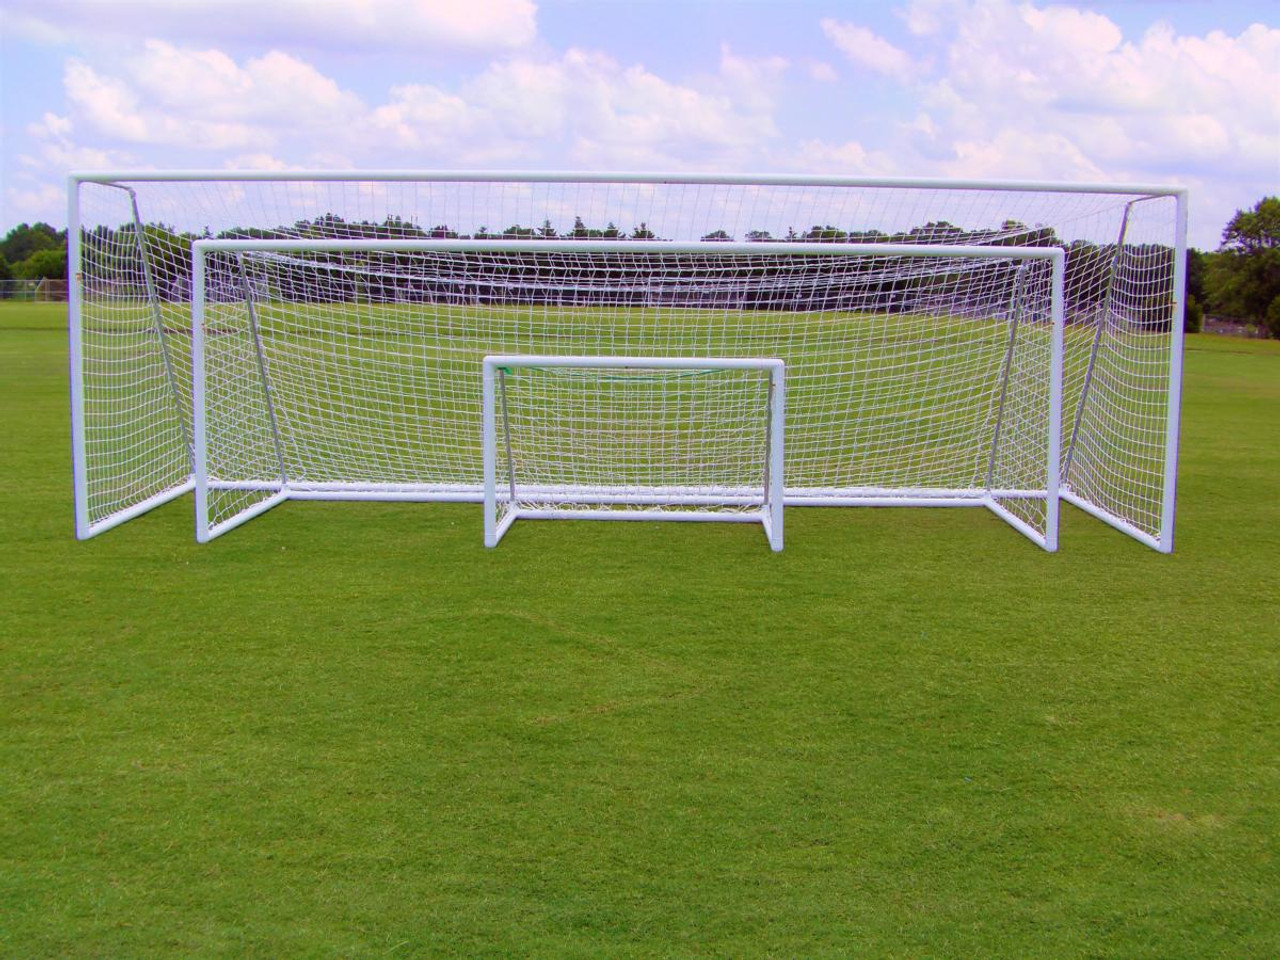 Pevo Soccer Goals Park Series 6.5' x 12'_4